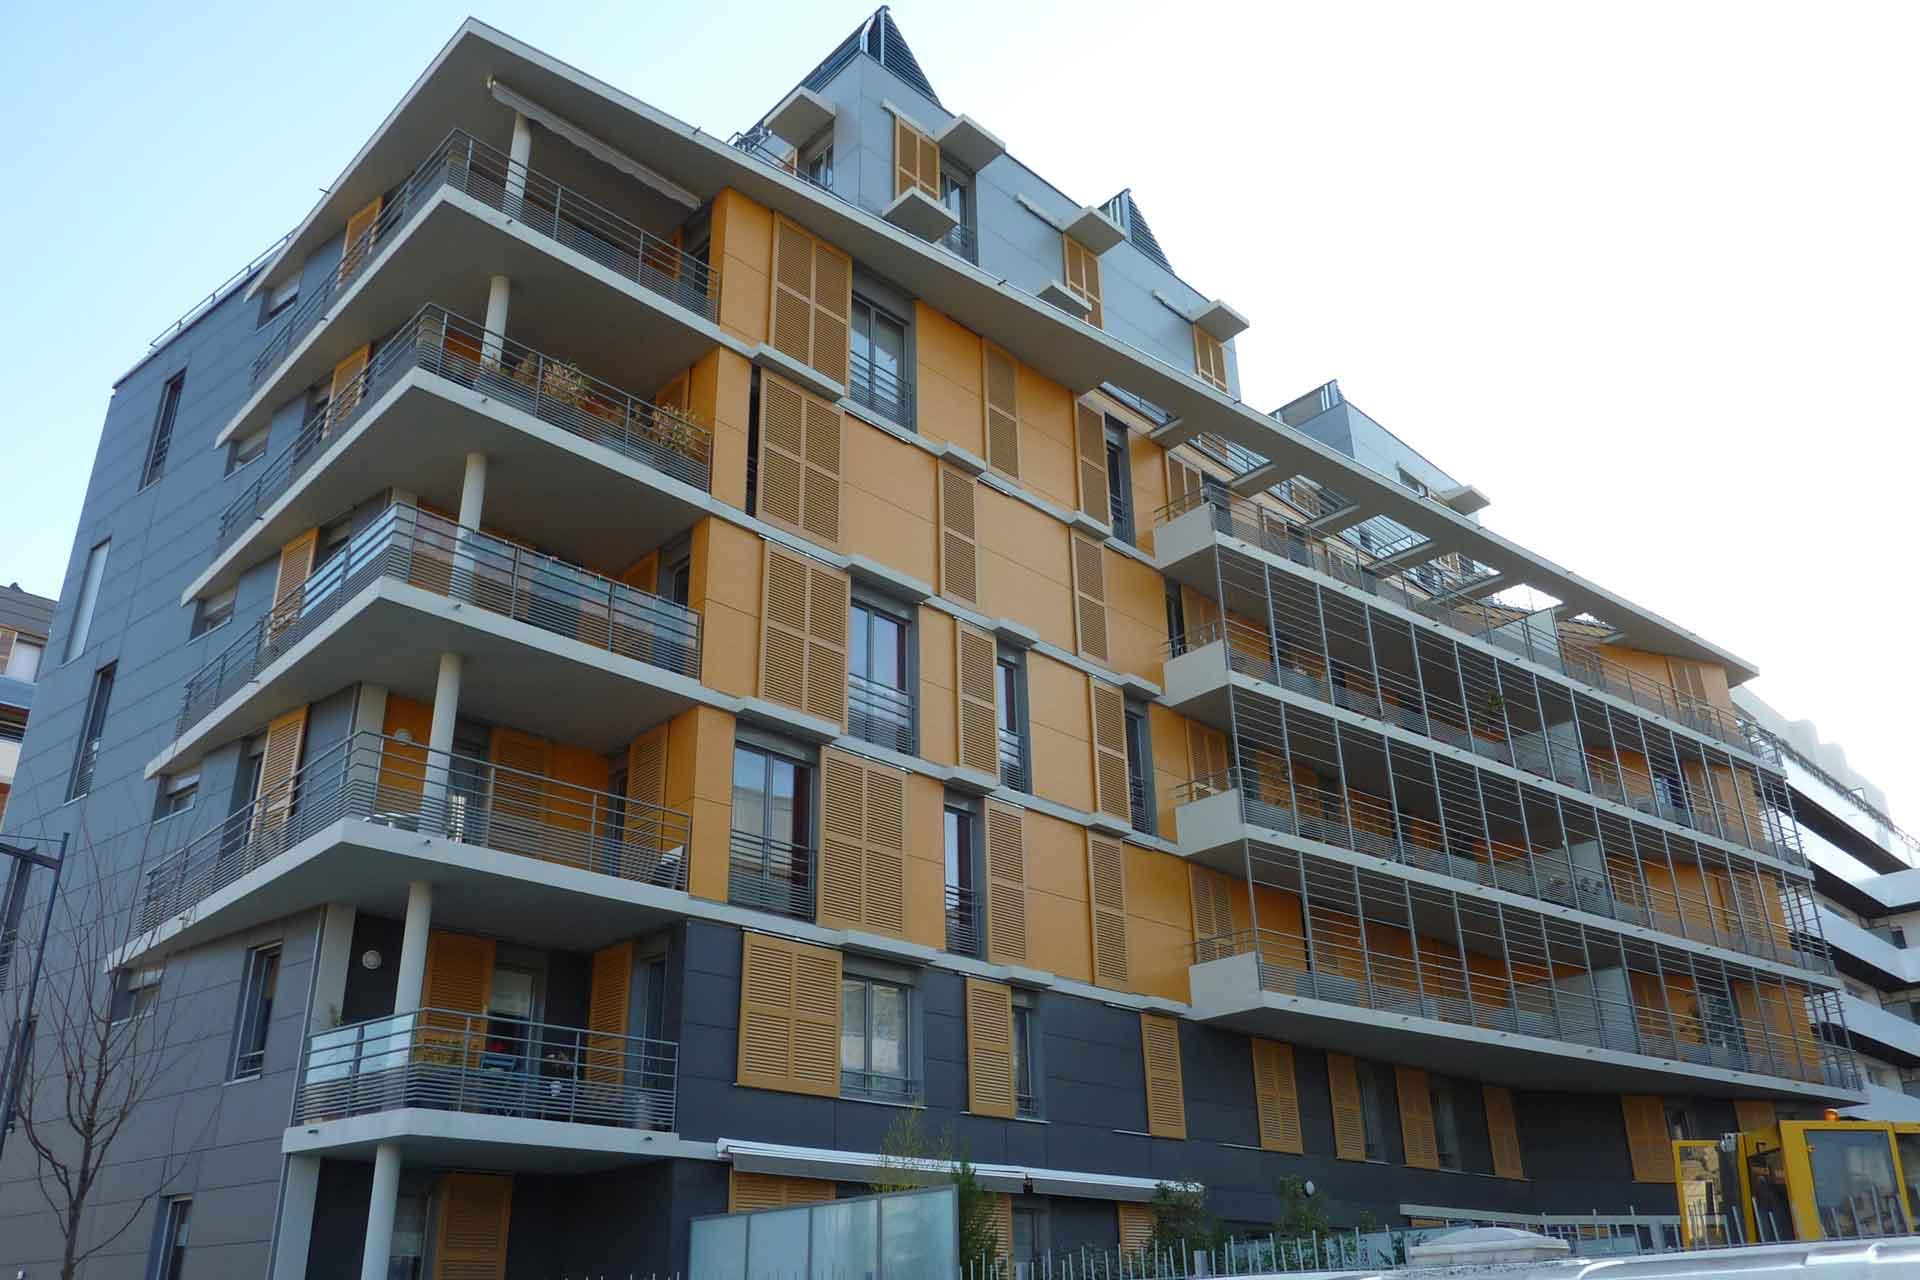 107-logement-vendome-img-(2)